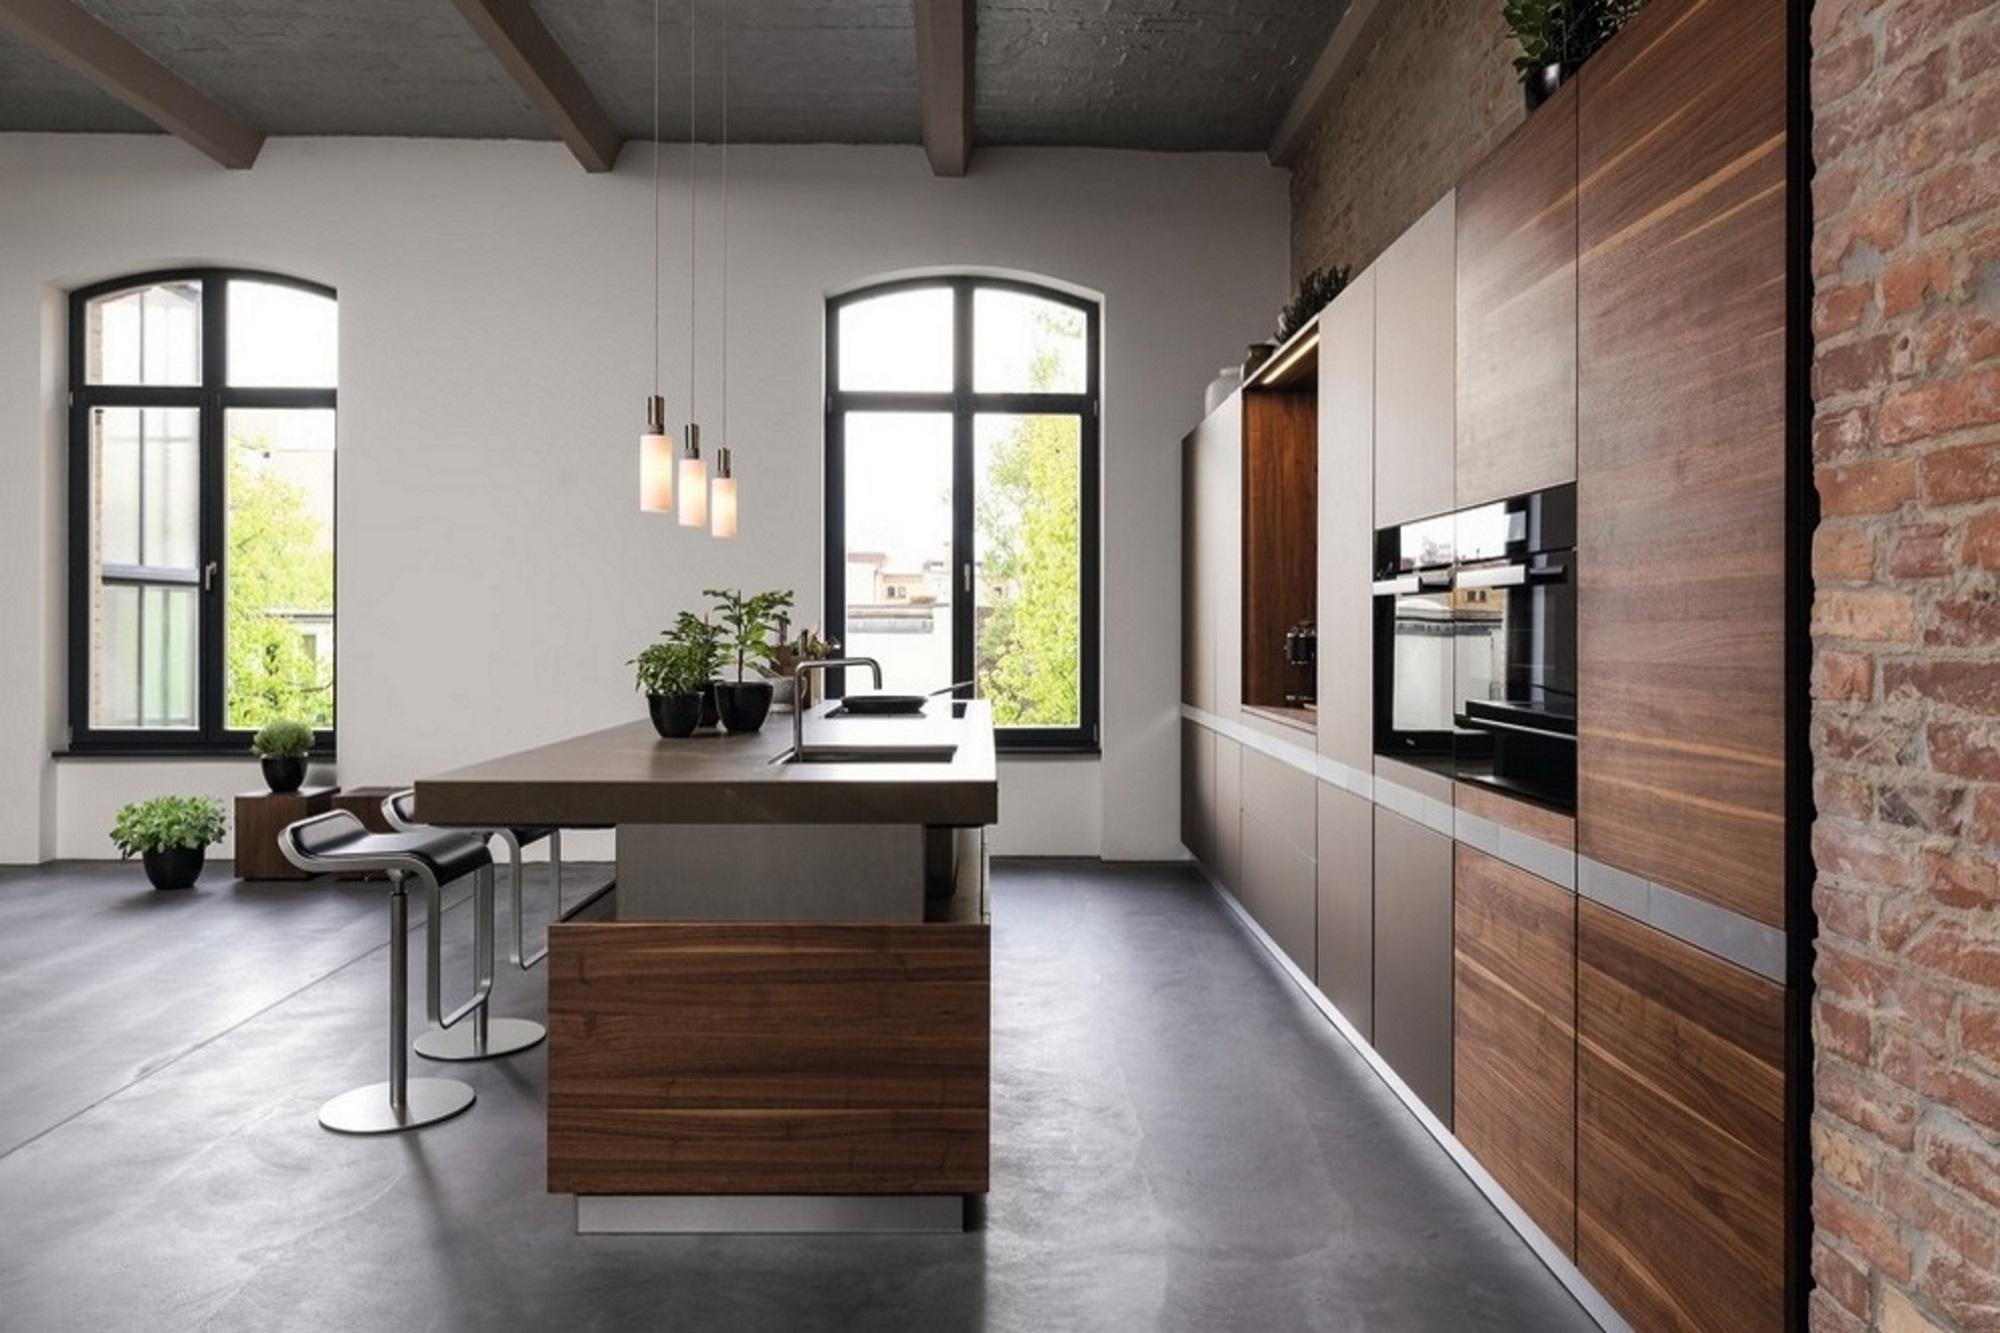 Küche K7 - Biomöbel Bonn